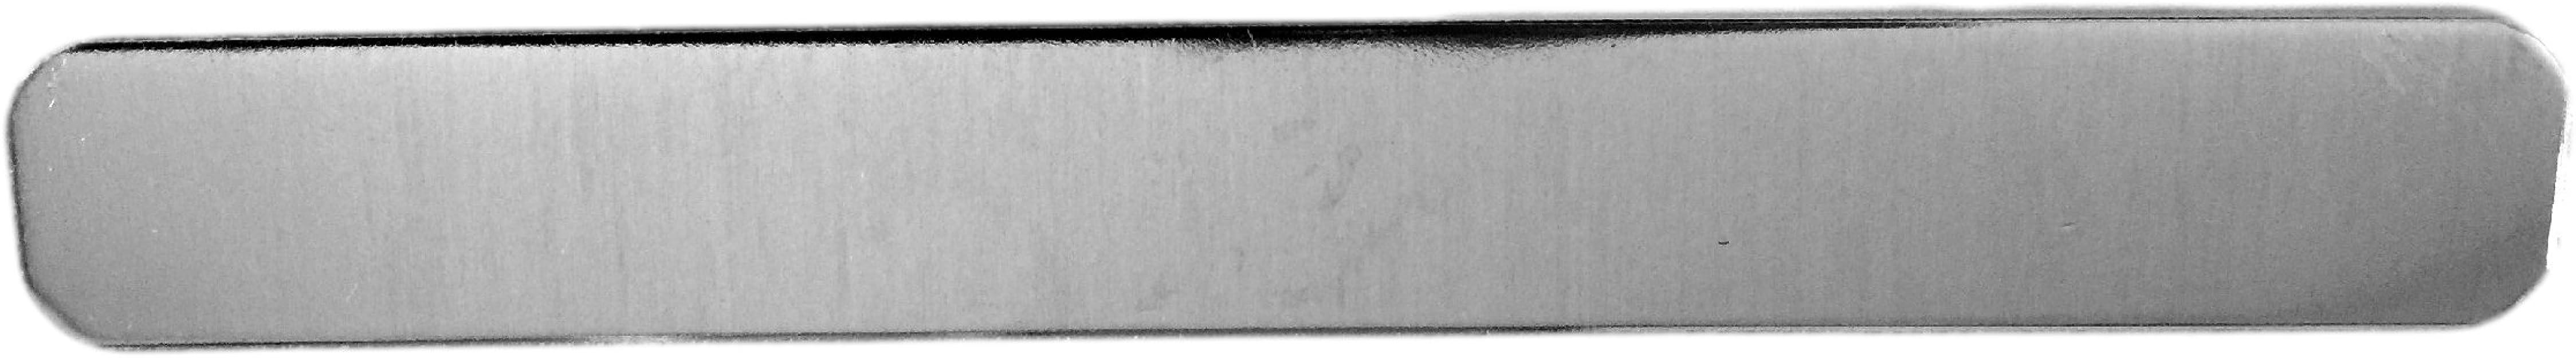 "Aluminum Cuff Bracelet Blanks 1//2/"" x 6/"" 1100 Type 14 Gauge De-burred Rounded"